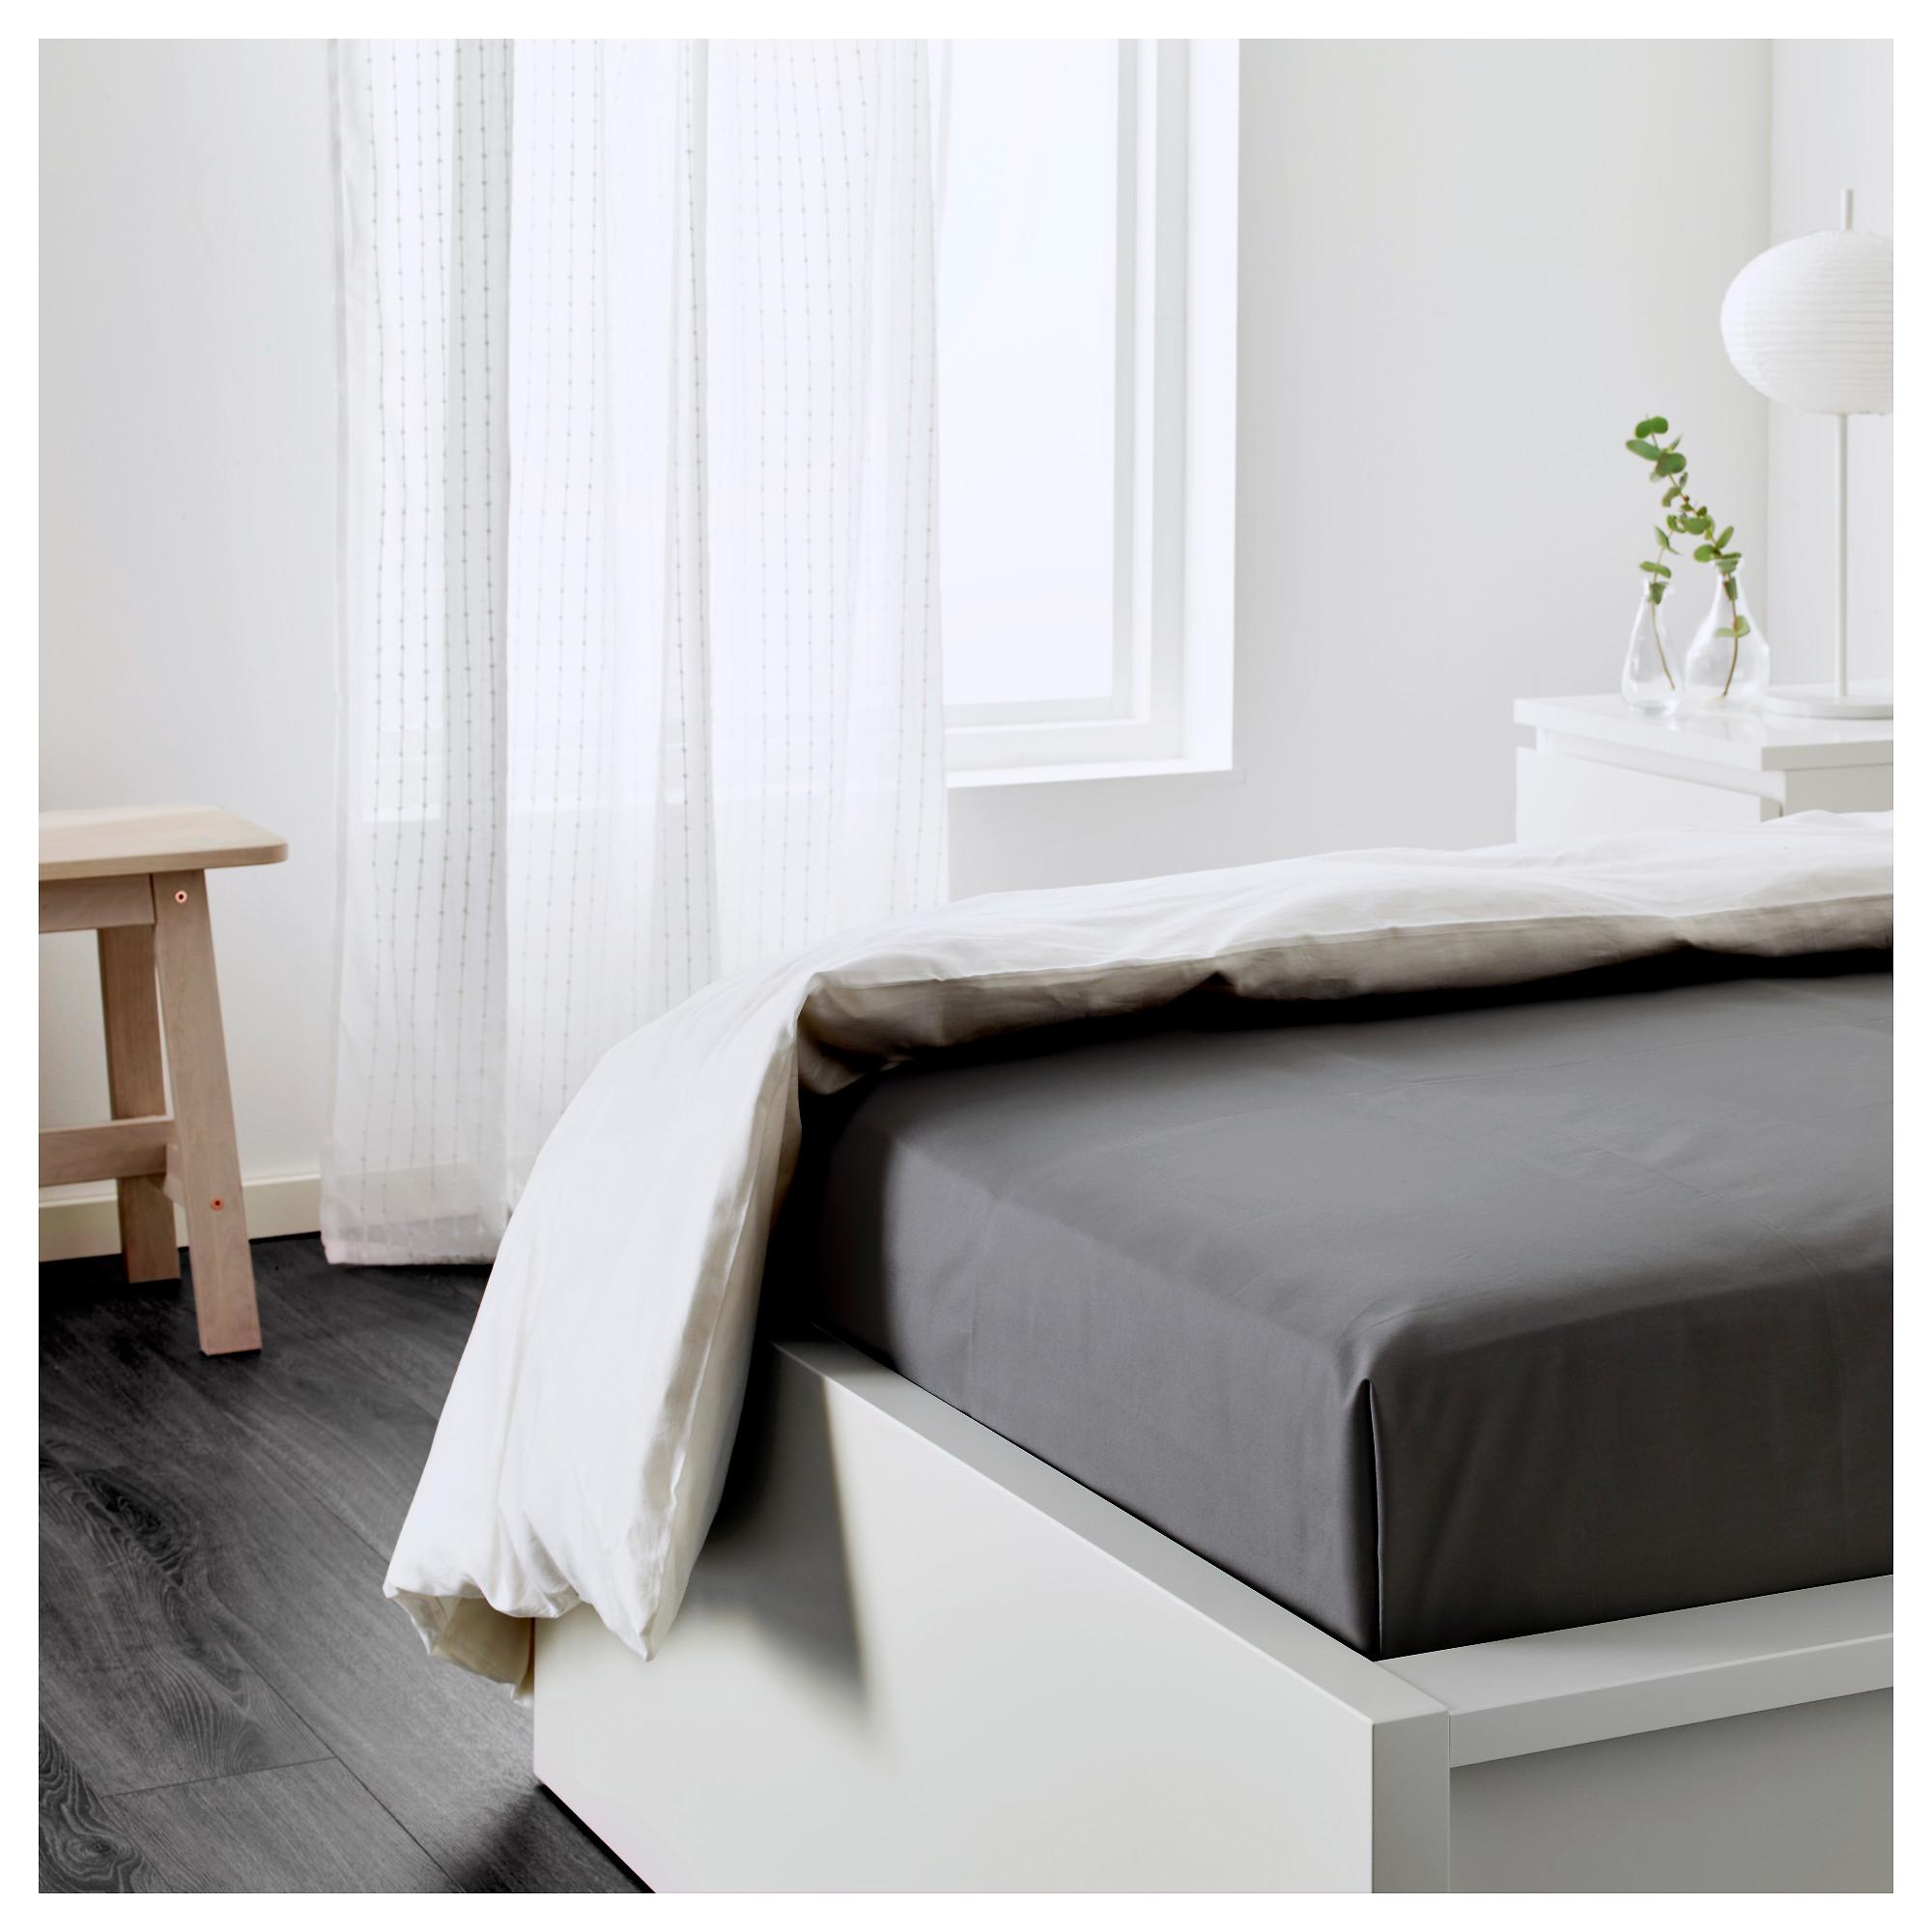 IKEA ULLVIDE SINGLE FITTED SHEET DARK GREY COTTON LYOCELL BLEND BEDDING